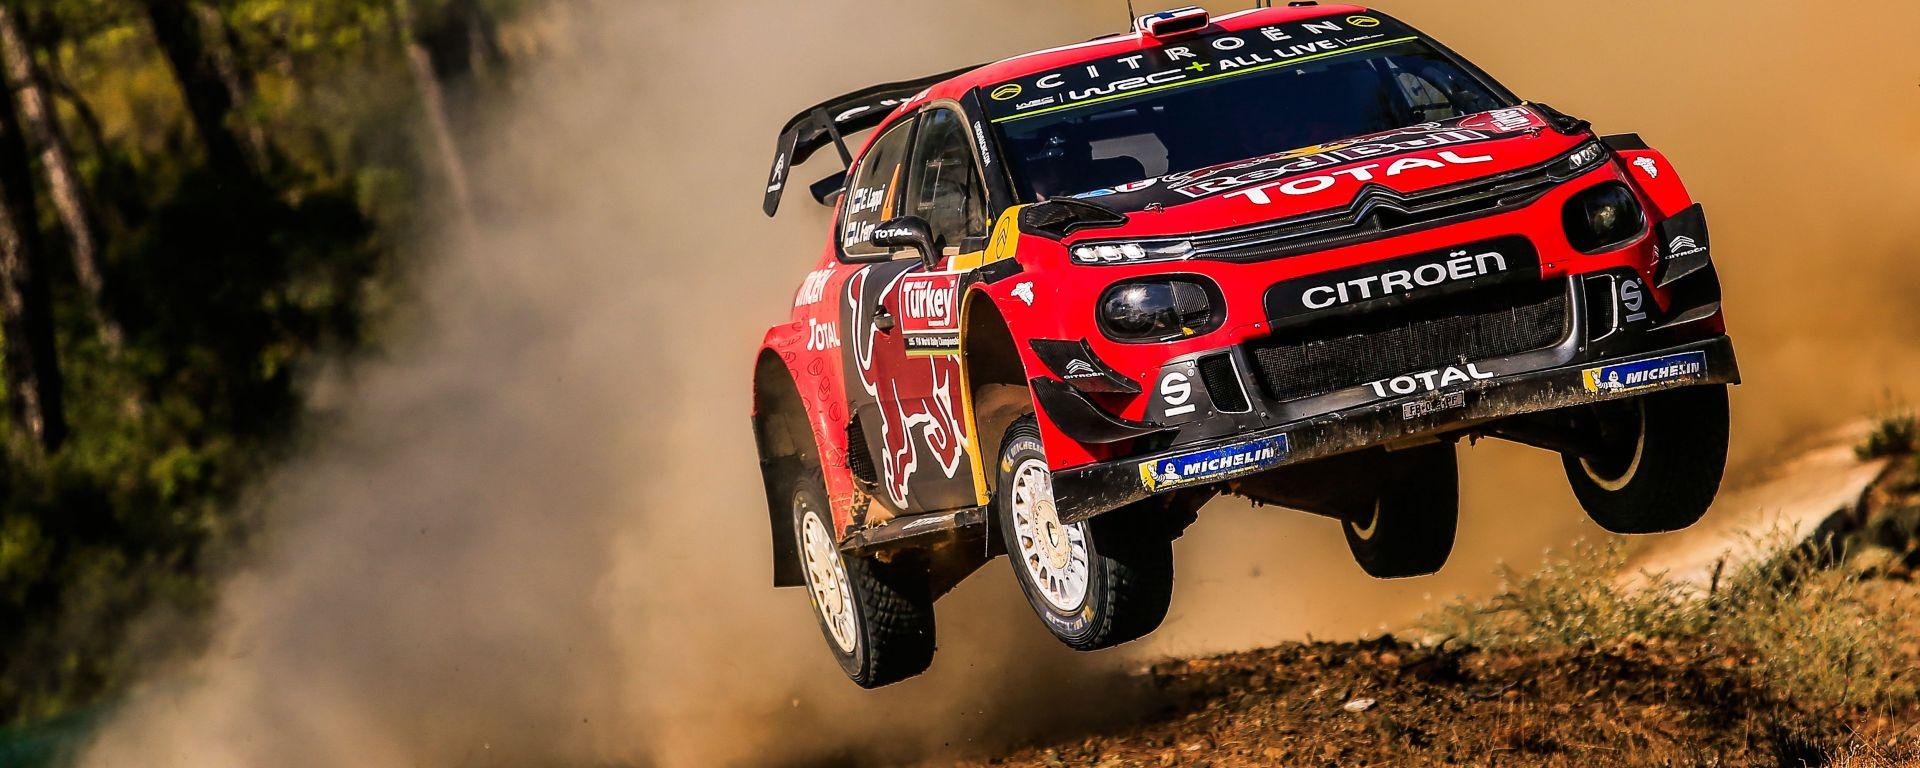 WRC 2019, la Citroen C3 Wrc Plus